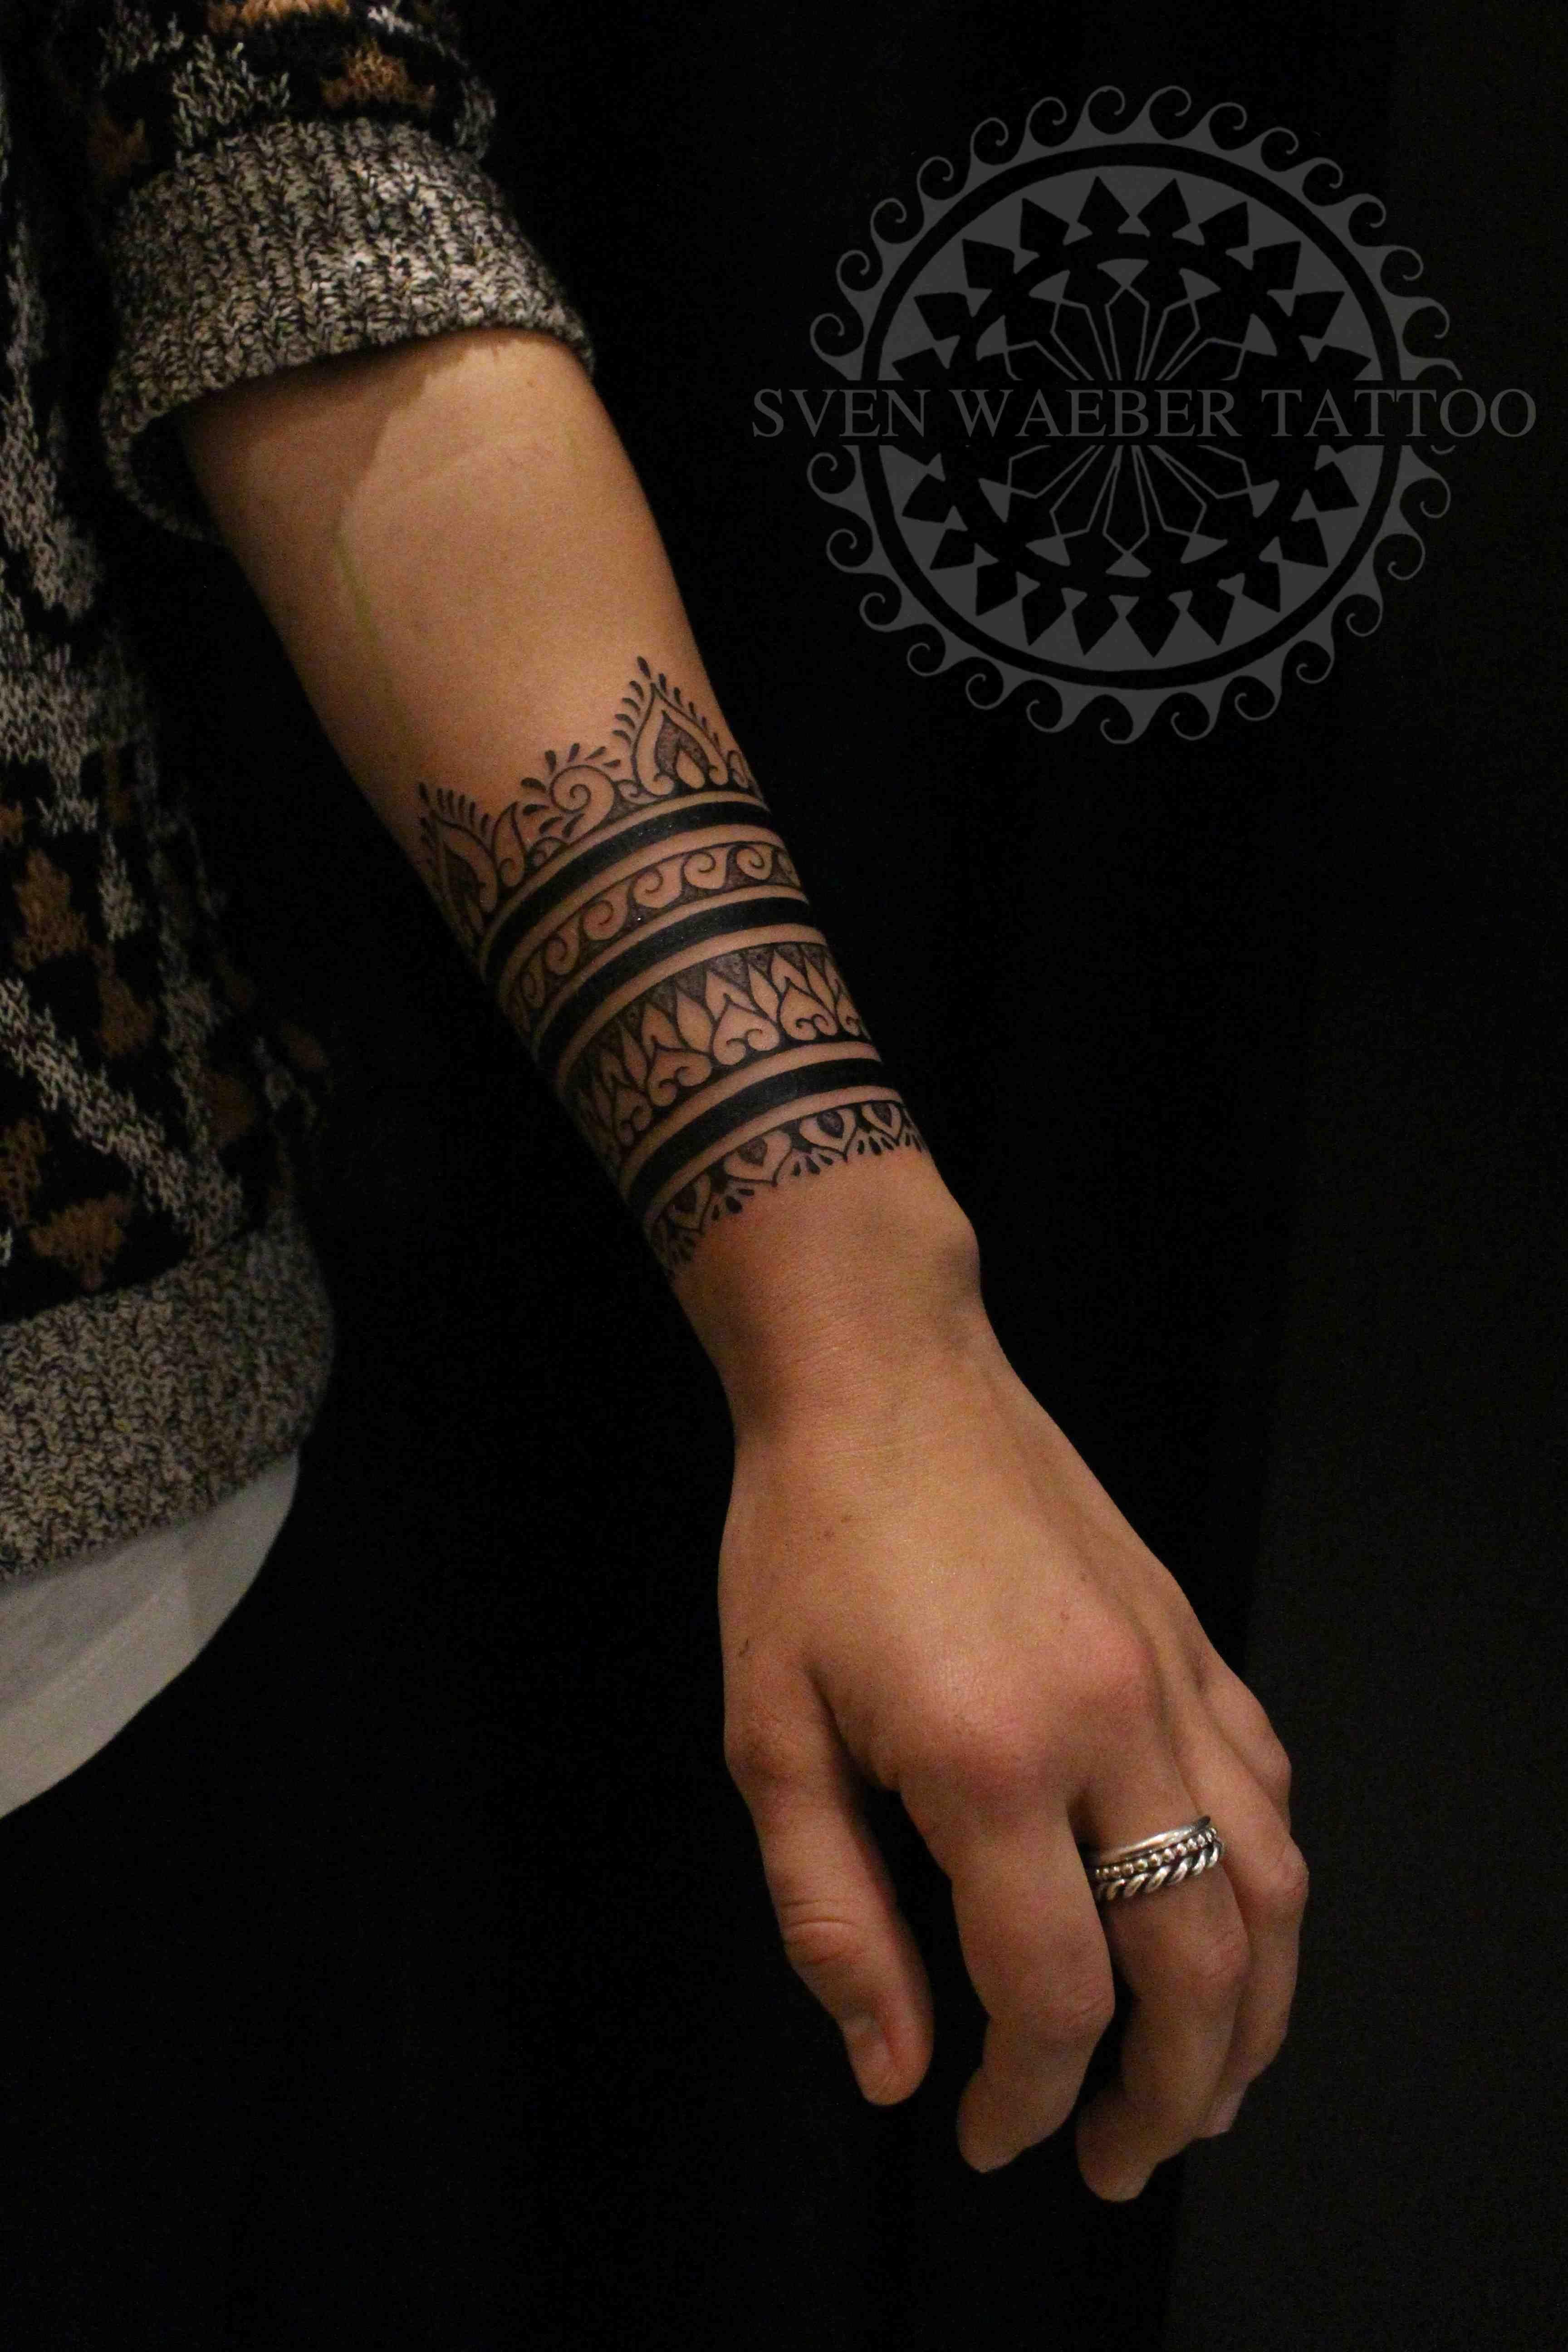 Pinterest Itsgeegi Ink Tatuajes Pequeños Tatuaje Maori